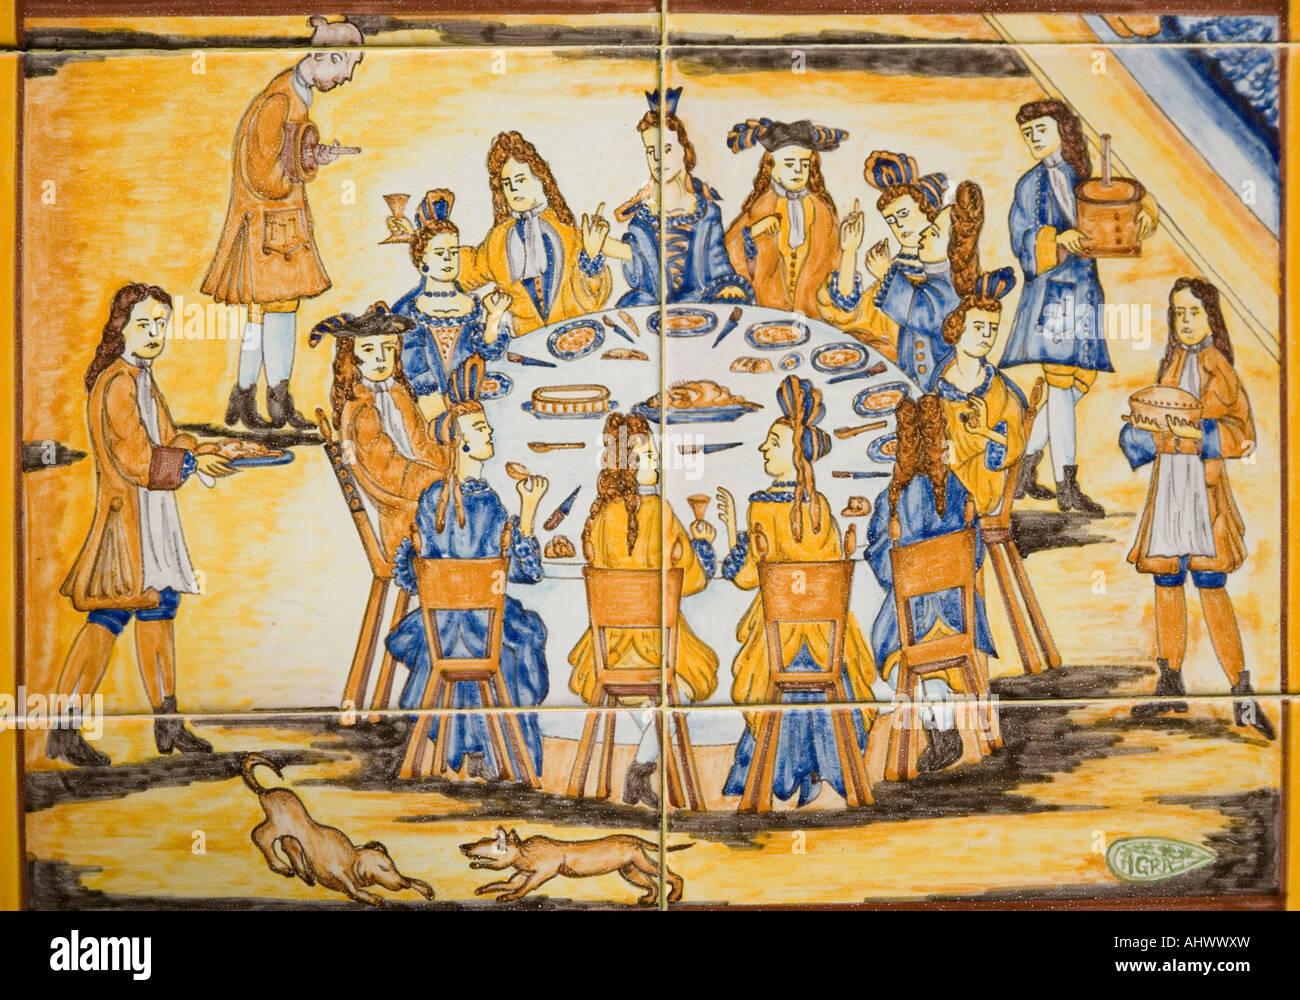 Ceramic tiles representing medieval dinner scene advertising the ceramic tiles representing medieval dinner scene advertising the asociacion de restaurantes gastronomicos de andalucia dailygadgetfo Choice Image